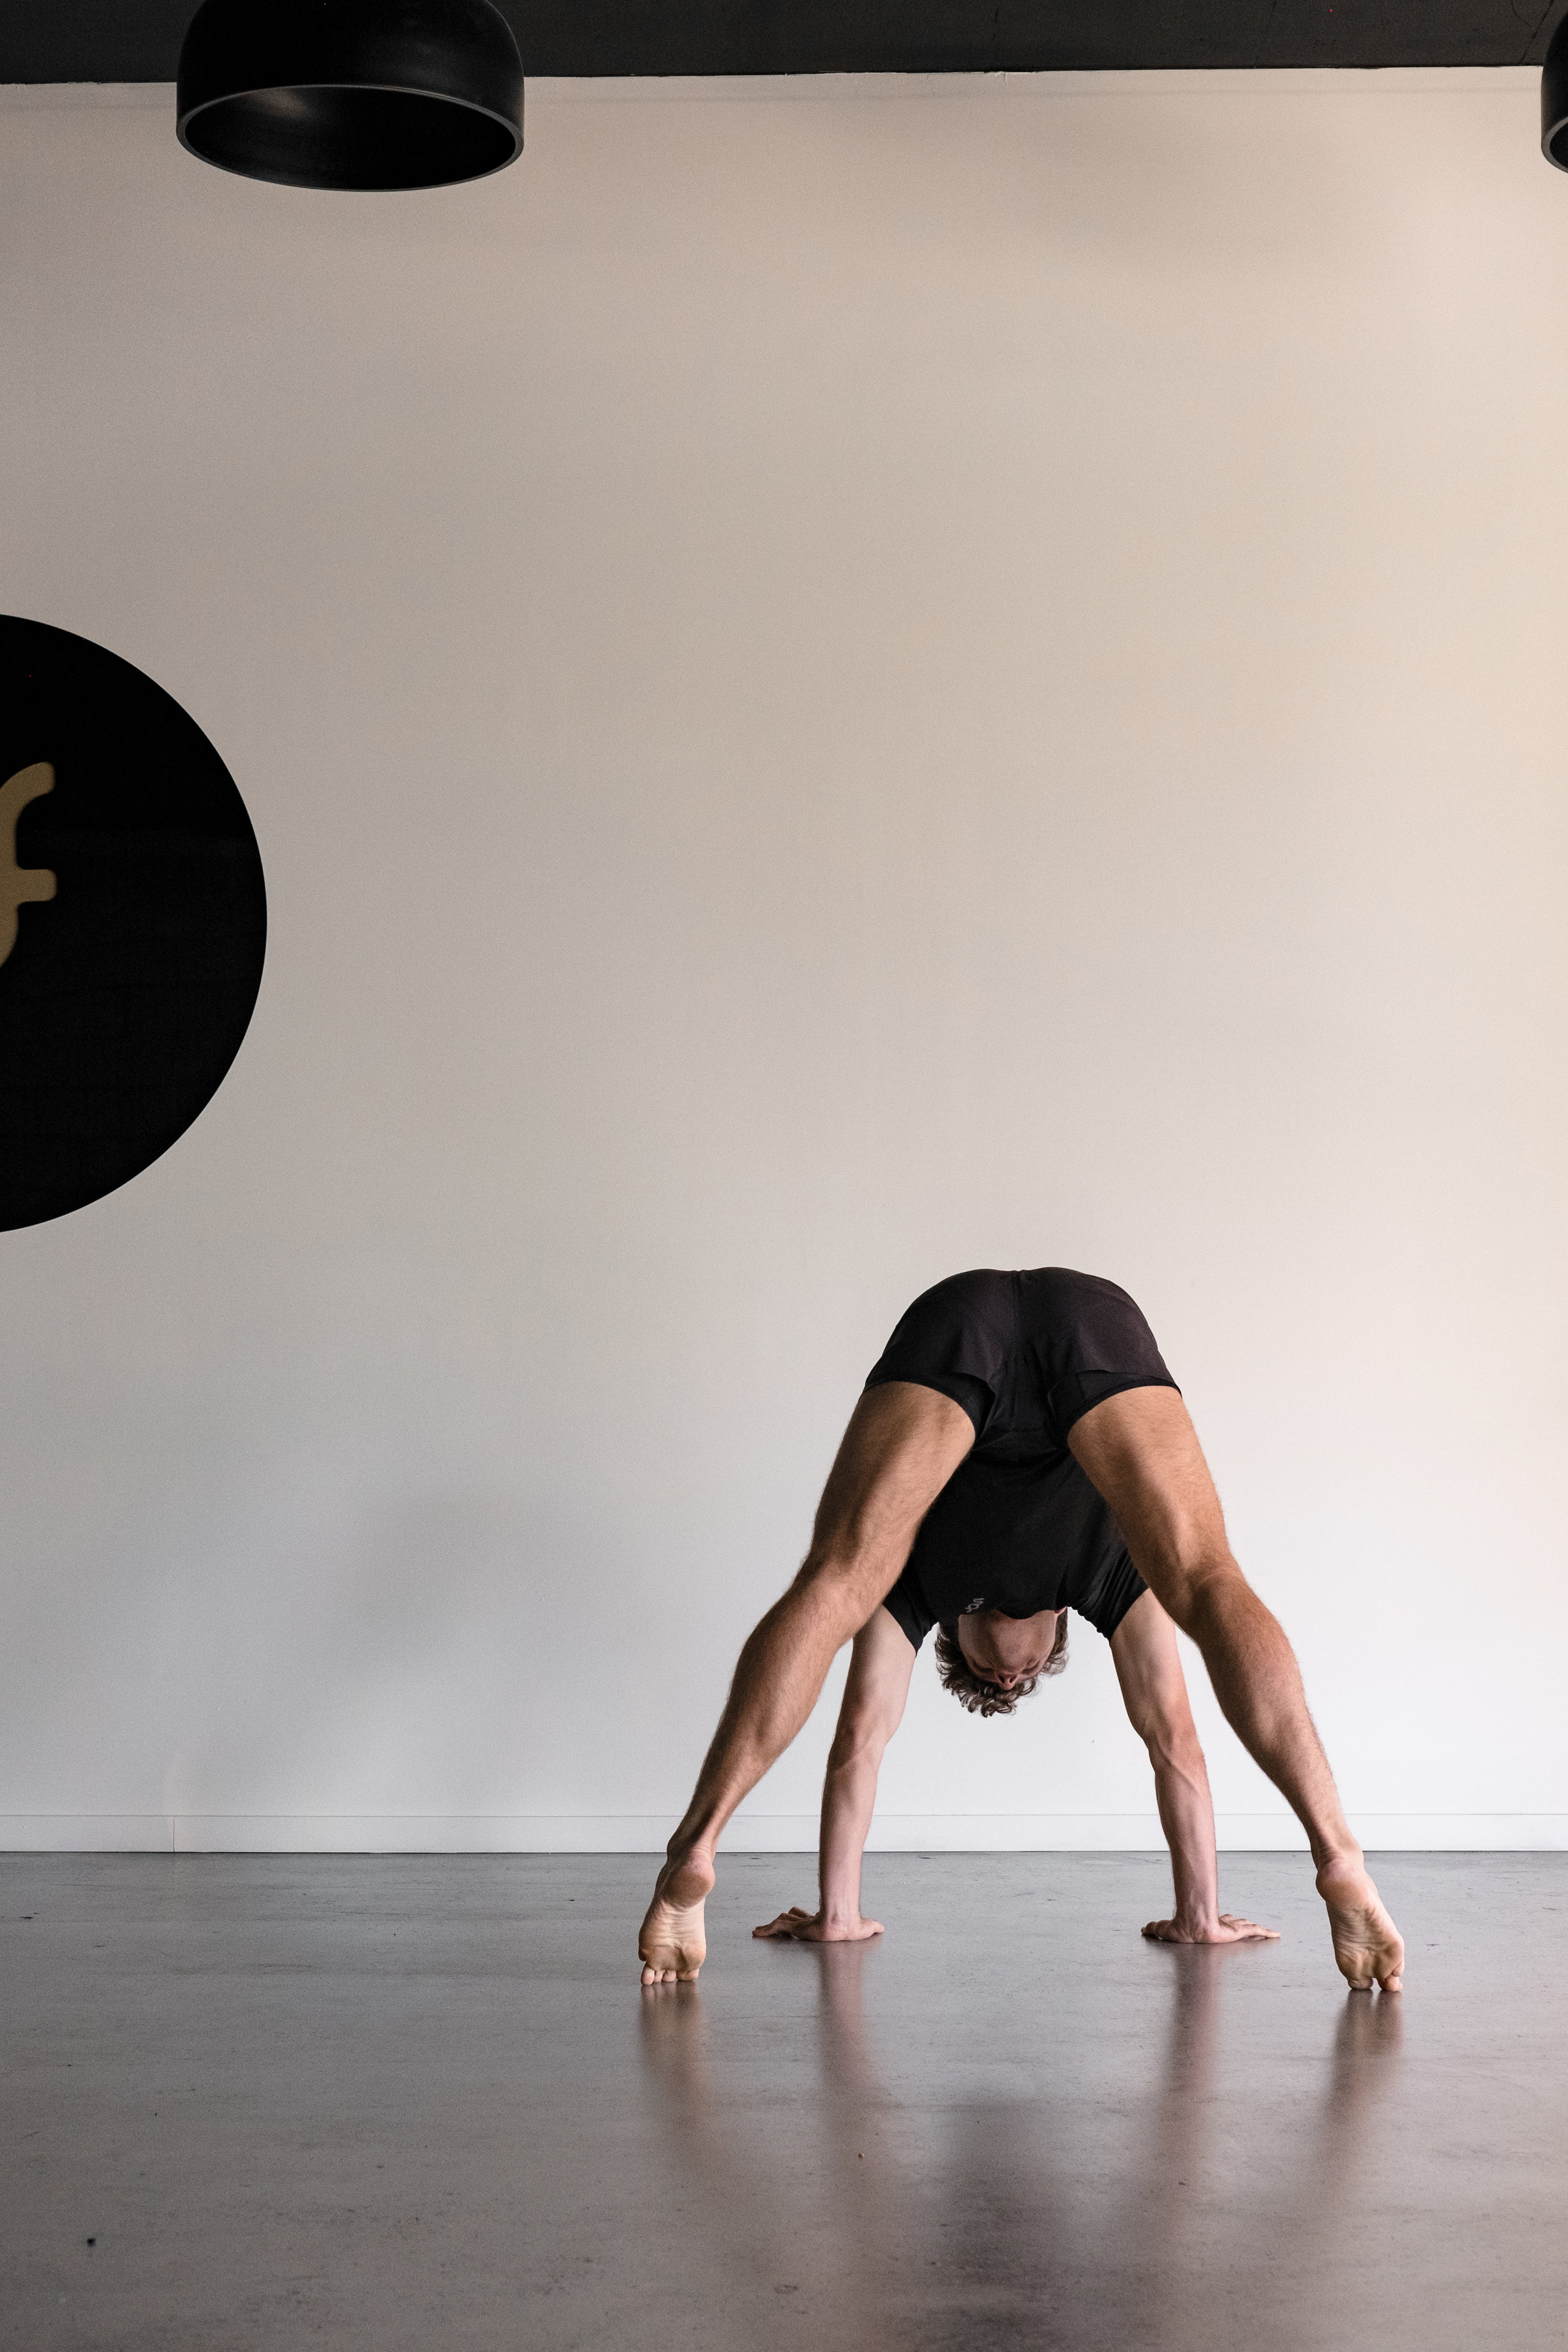 Handstand_Preparation_Training (34 of 38).jpg